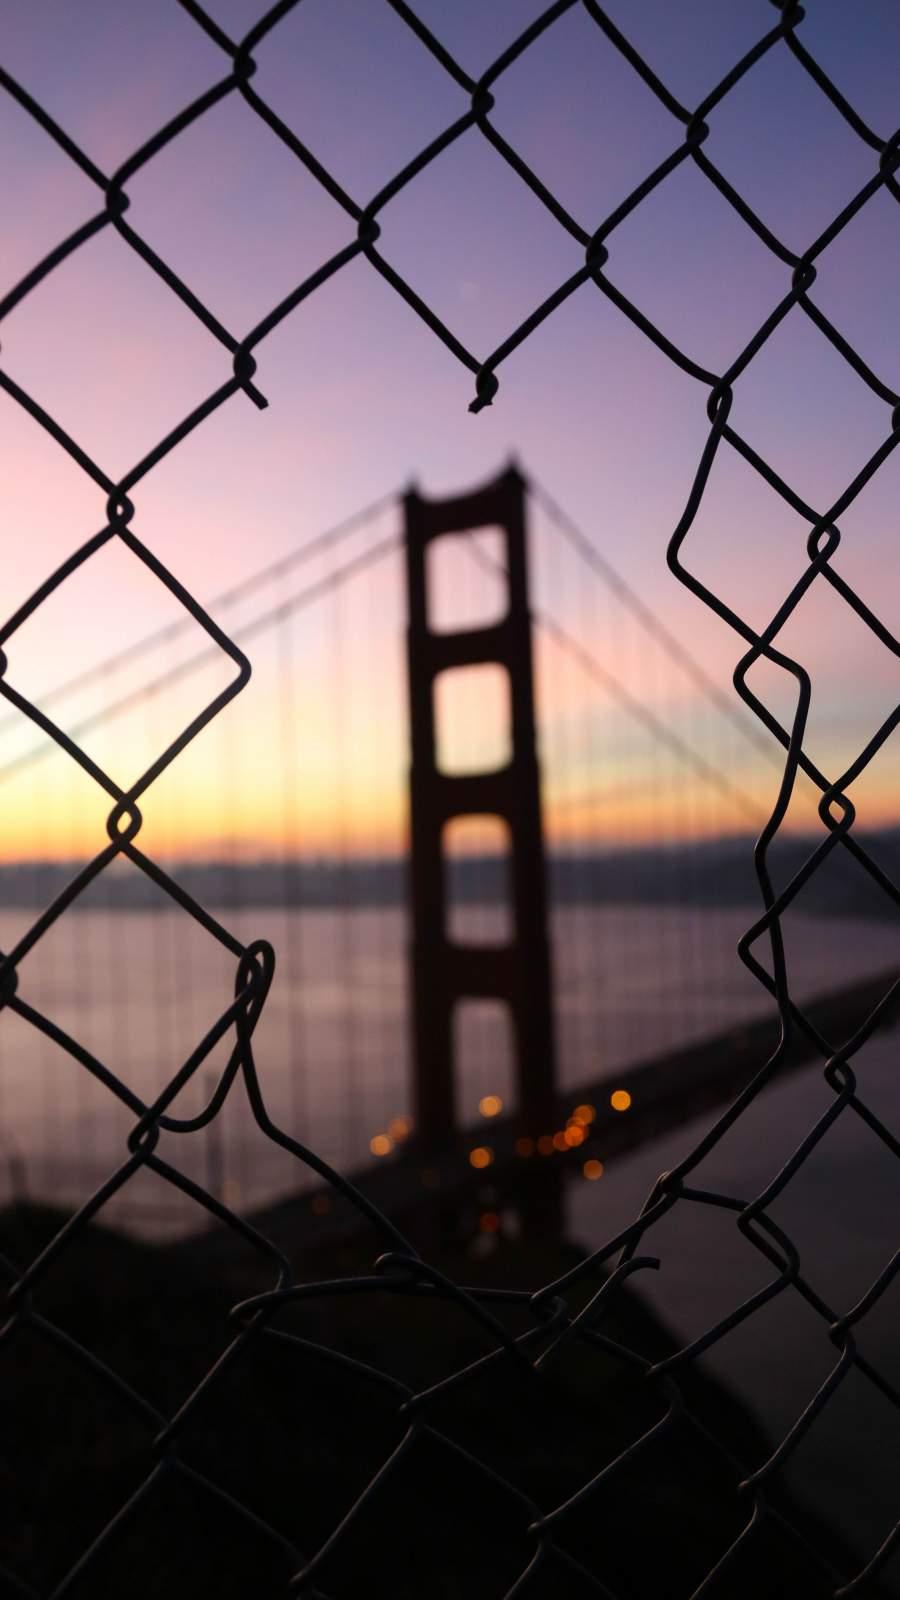 Morning Bridge Sunrise iPhone Wallpaper